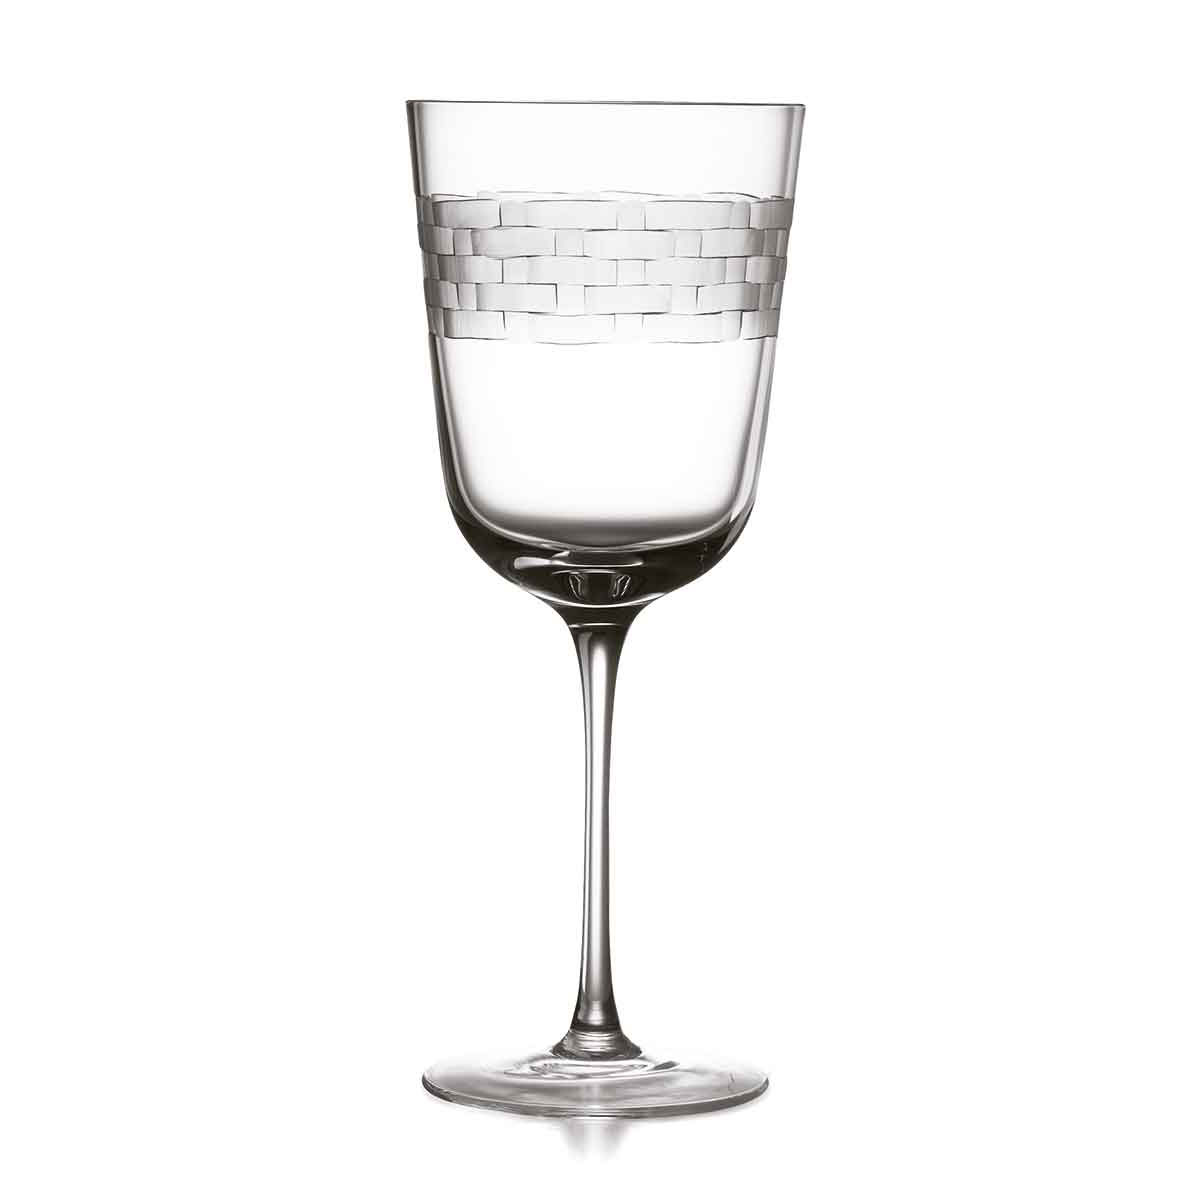 Michael Aram, Palm Crystal Wine Glass, Single